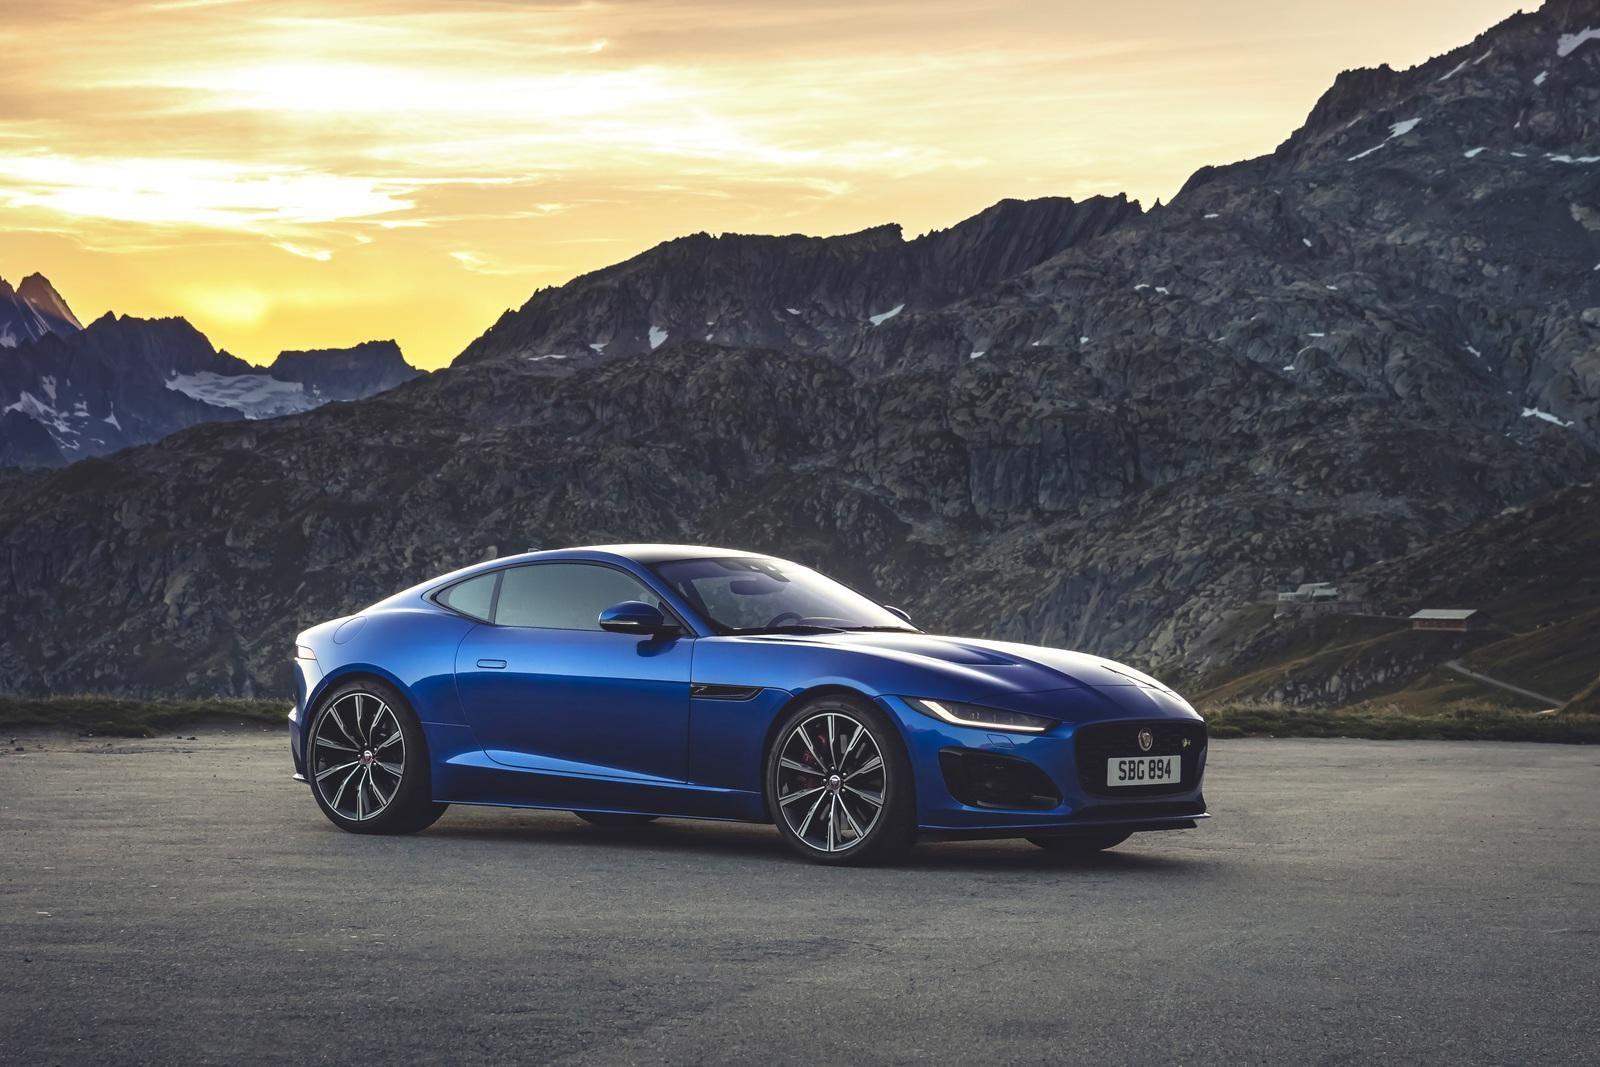 2020 Jaguar Xq Crossover Release Date